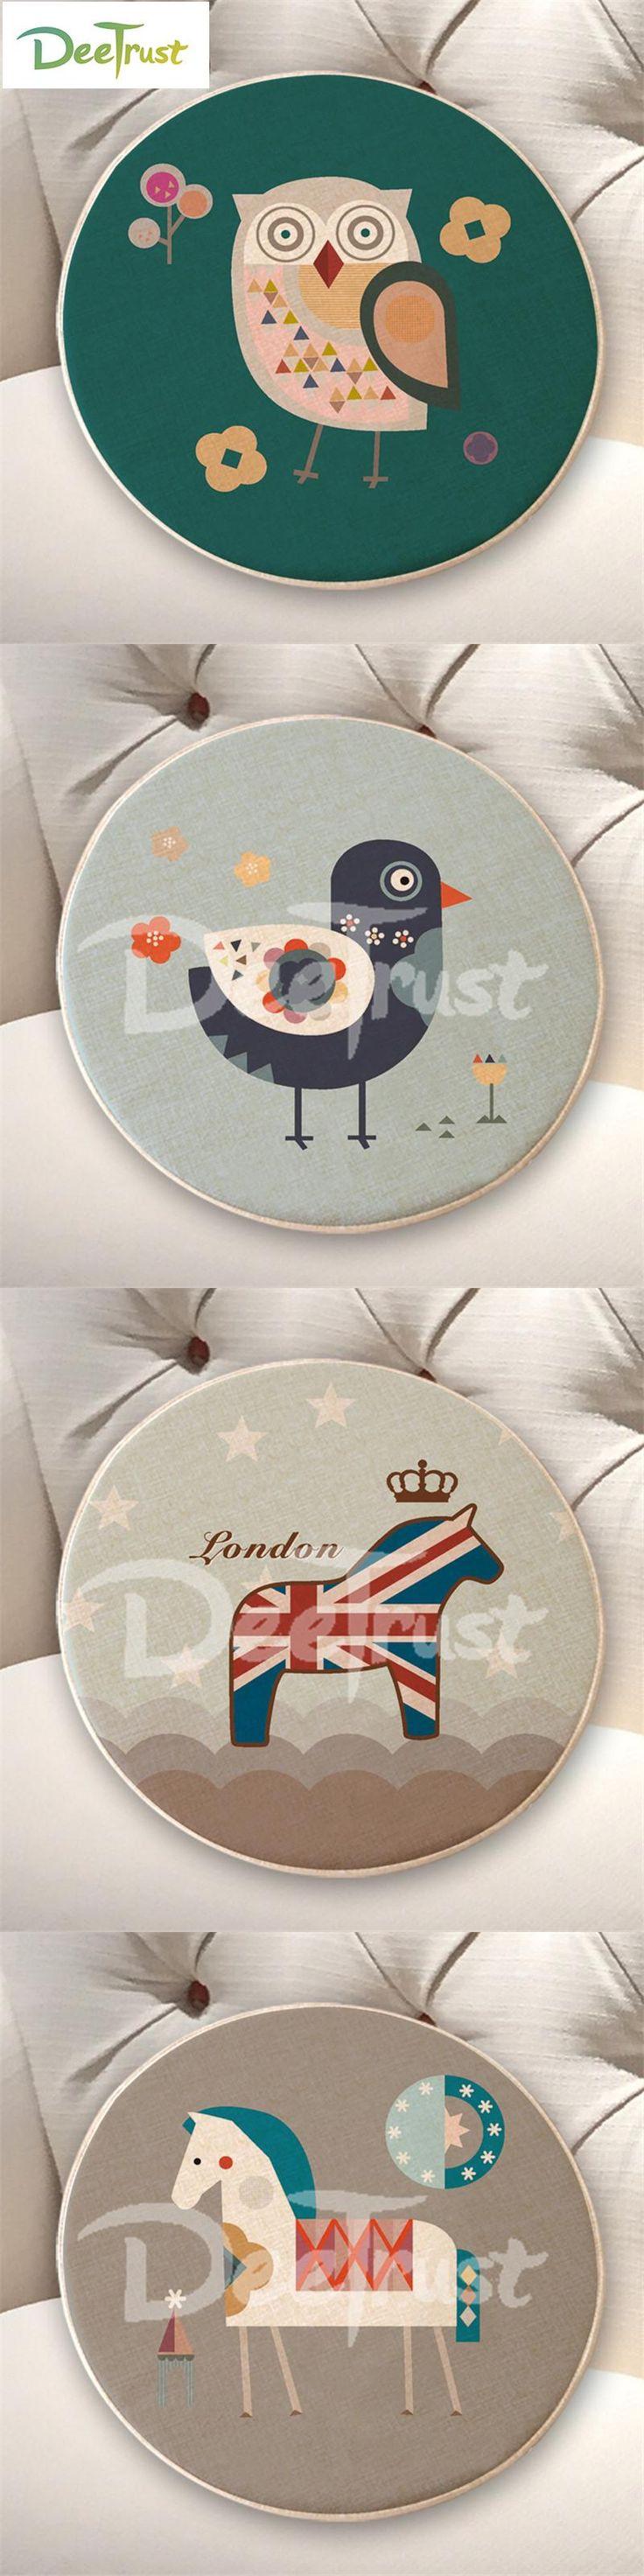 European London Cotton Linen Pillow Round Owl Bird Tree Seat Cushion Thick Foam Cartoon Animal Throw Pillow Washable Cojines